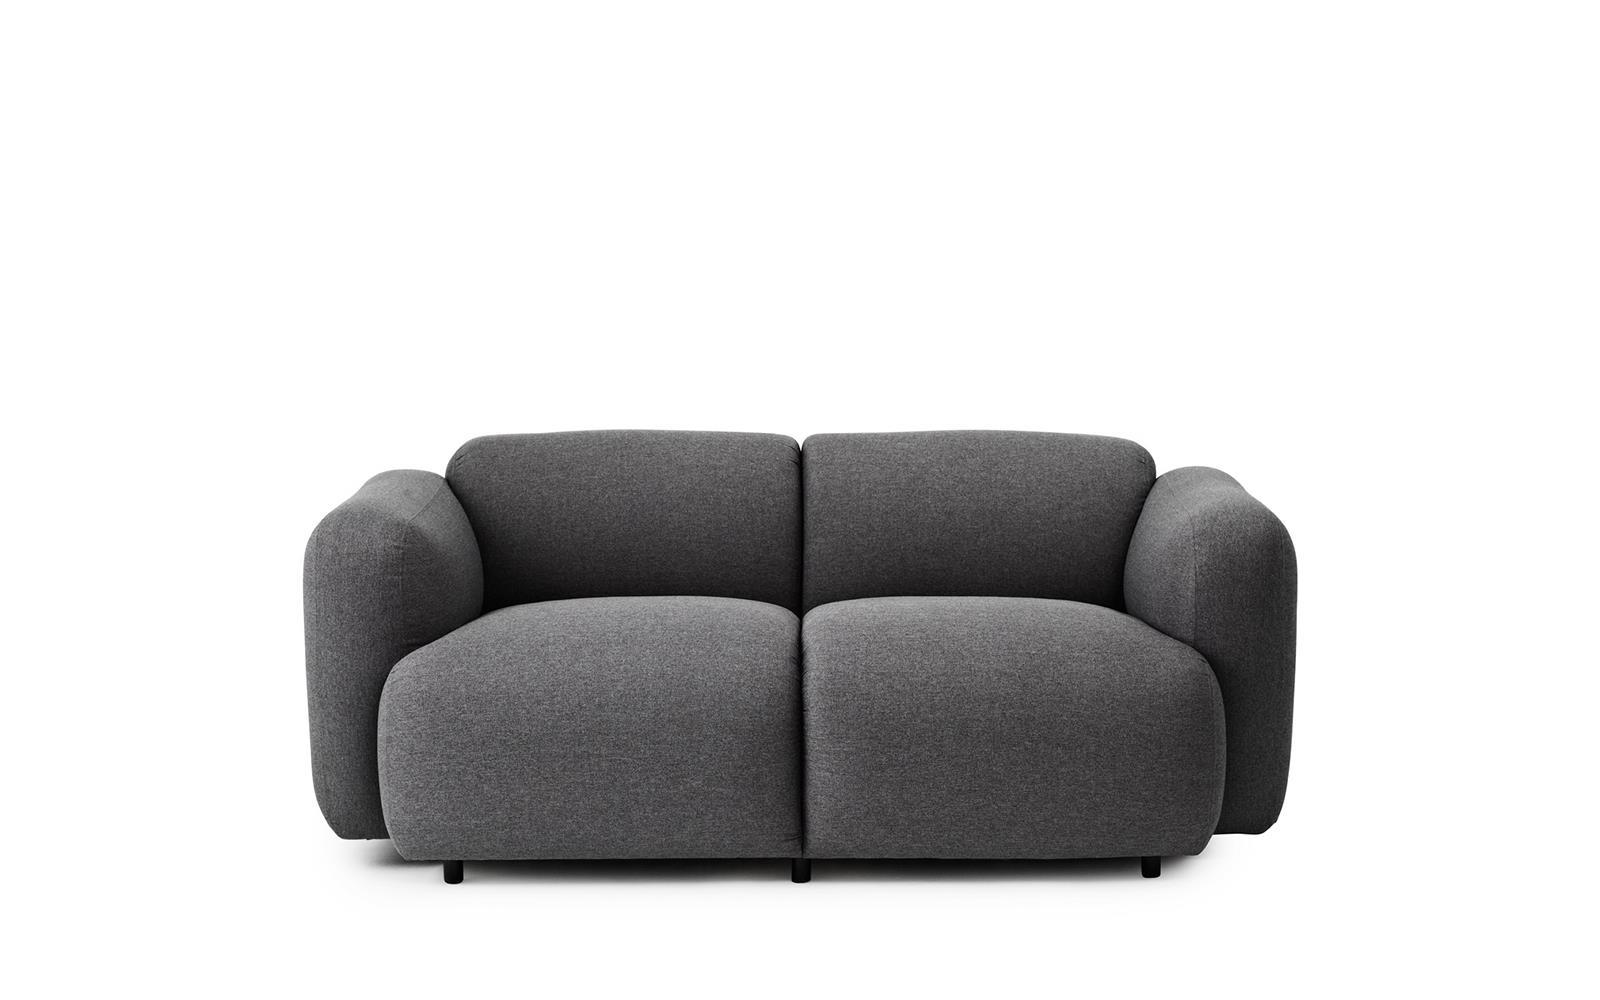 Swell Sofa 2 Seater Breeze Fusion